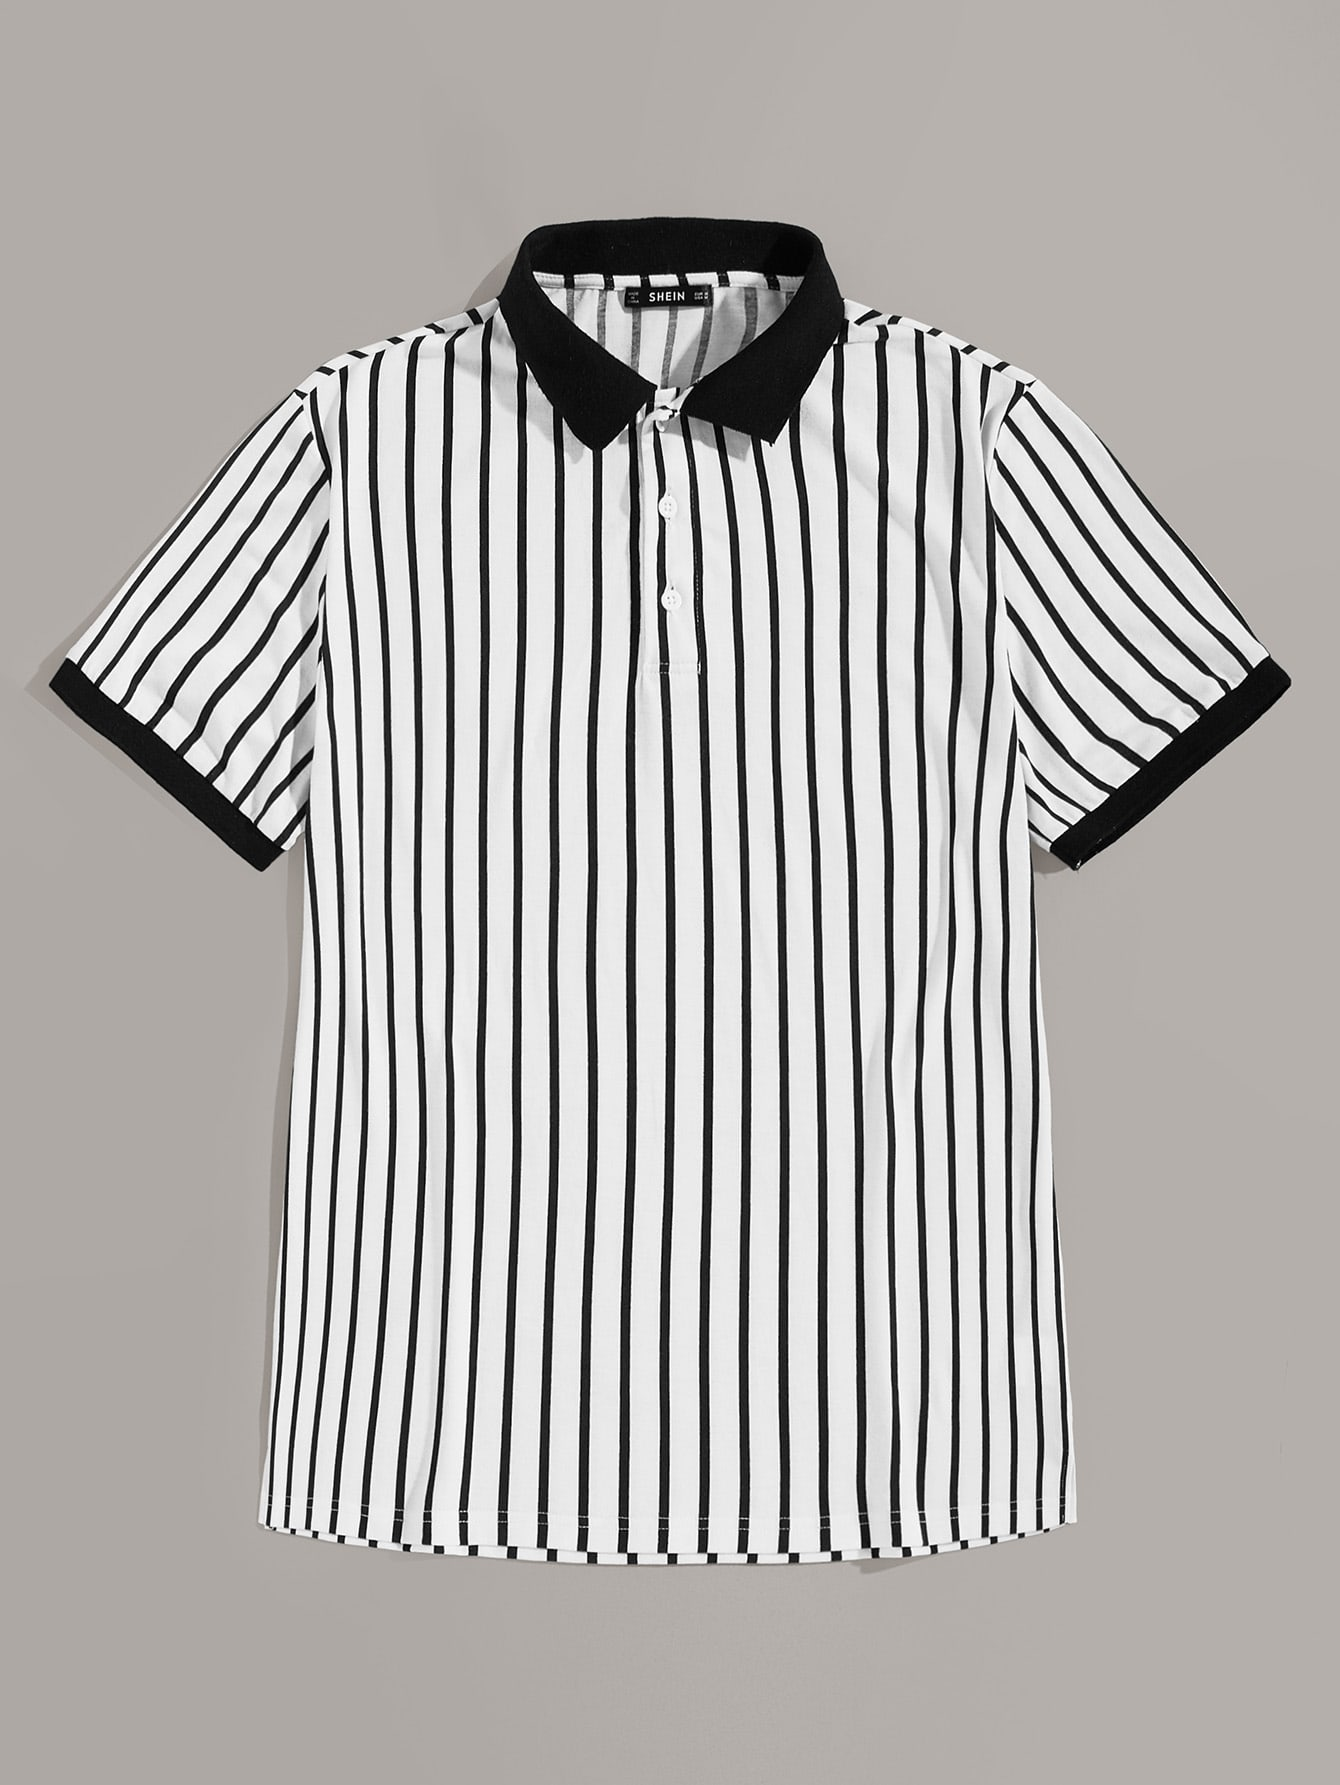 da4653db92 Guys Contrast Collar and Cuff Striped Polo Shirt | ROMWE